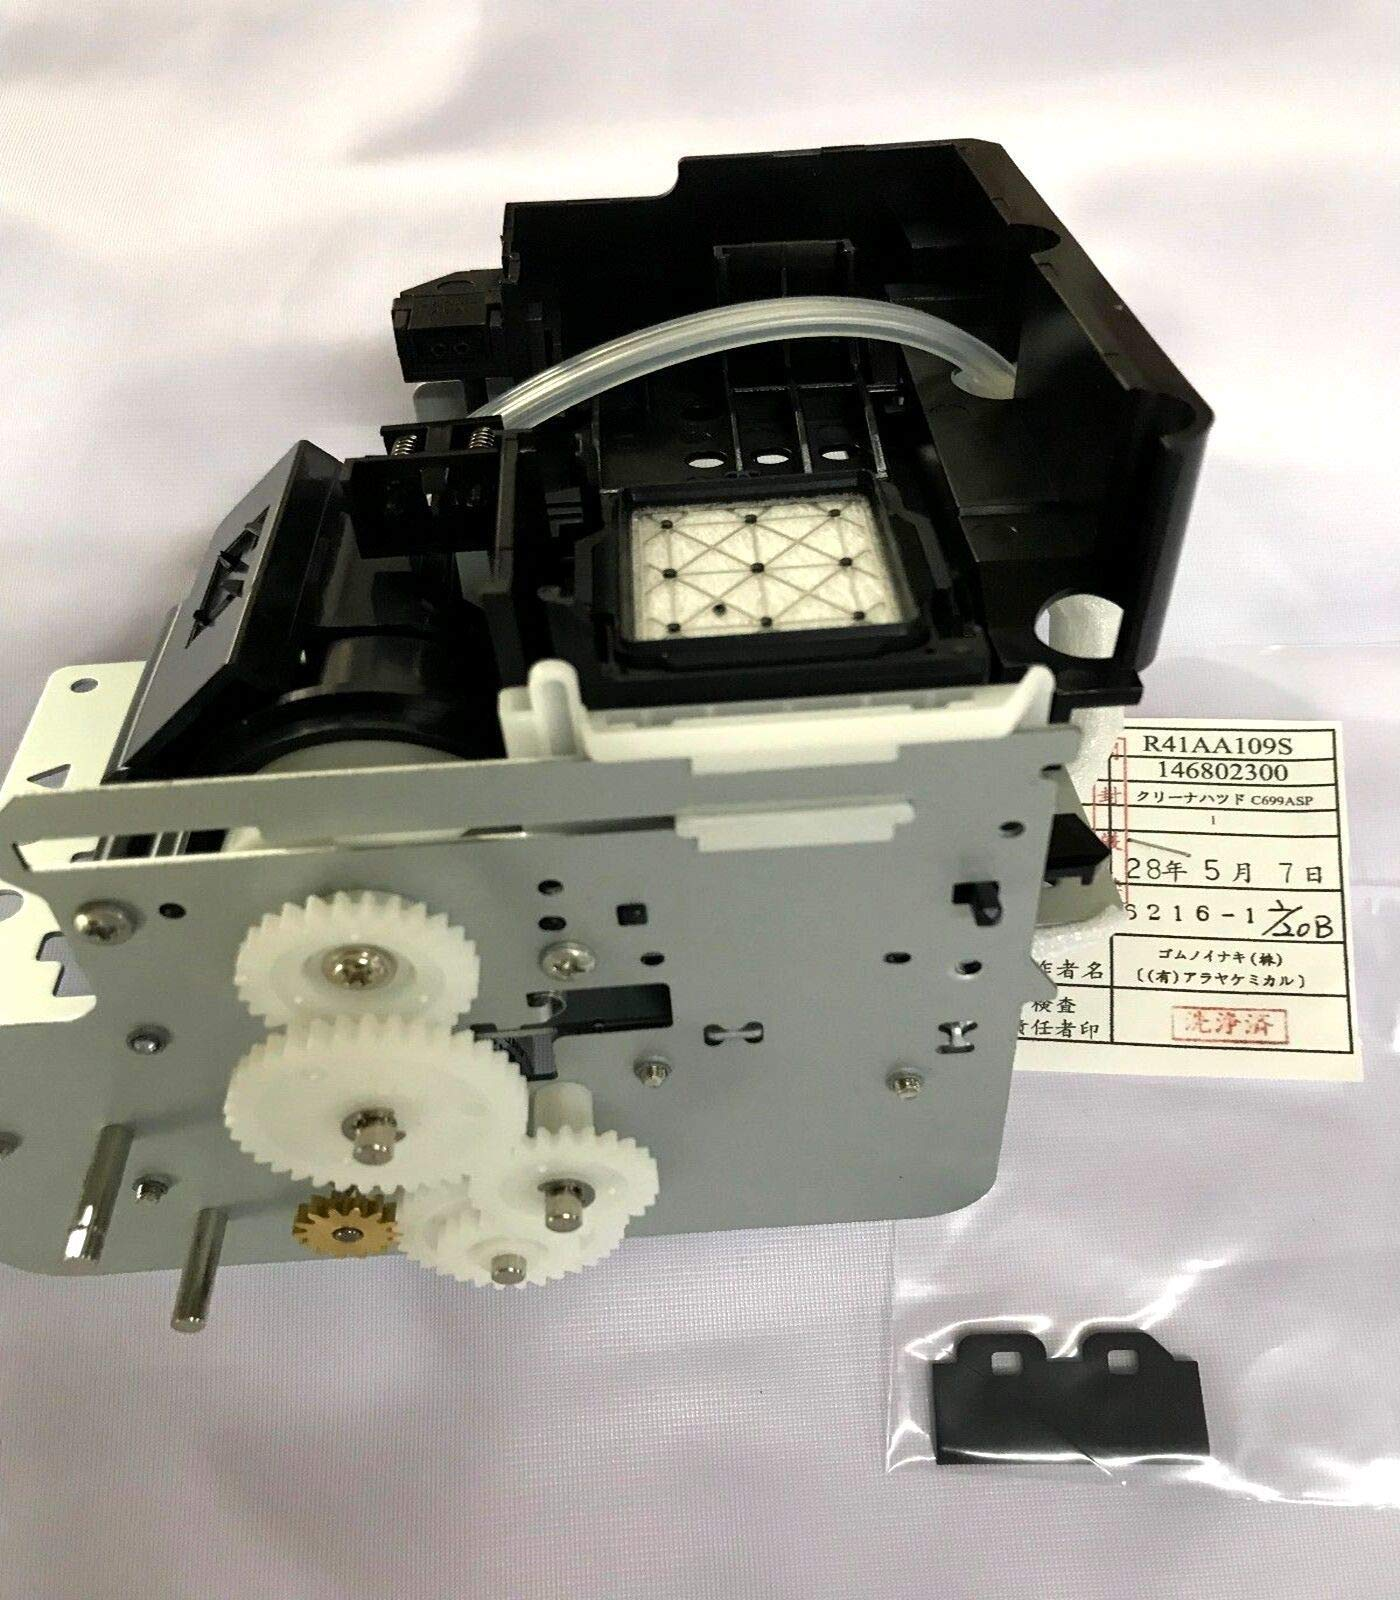 Pump Capping Assembly Station Solvent Resistant for Mutoh VJ-1604E VJ-1304/ VJ-1624 VJ-1614/VJ-1604A